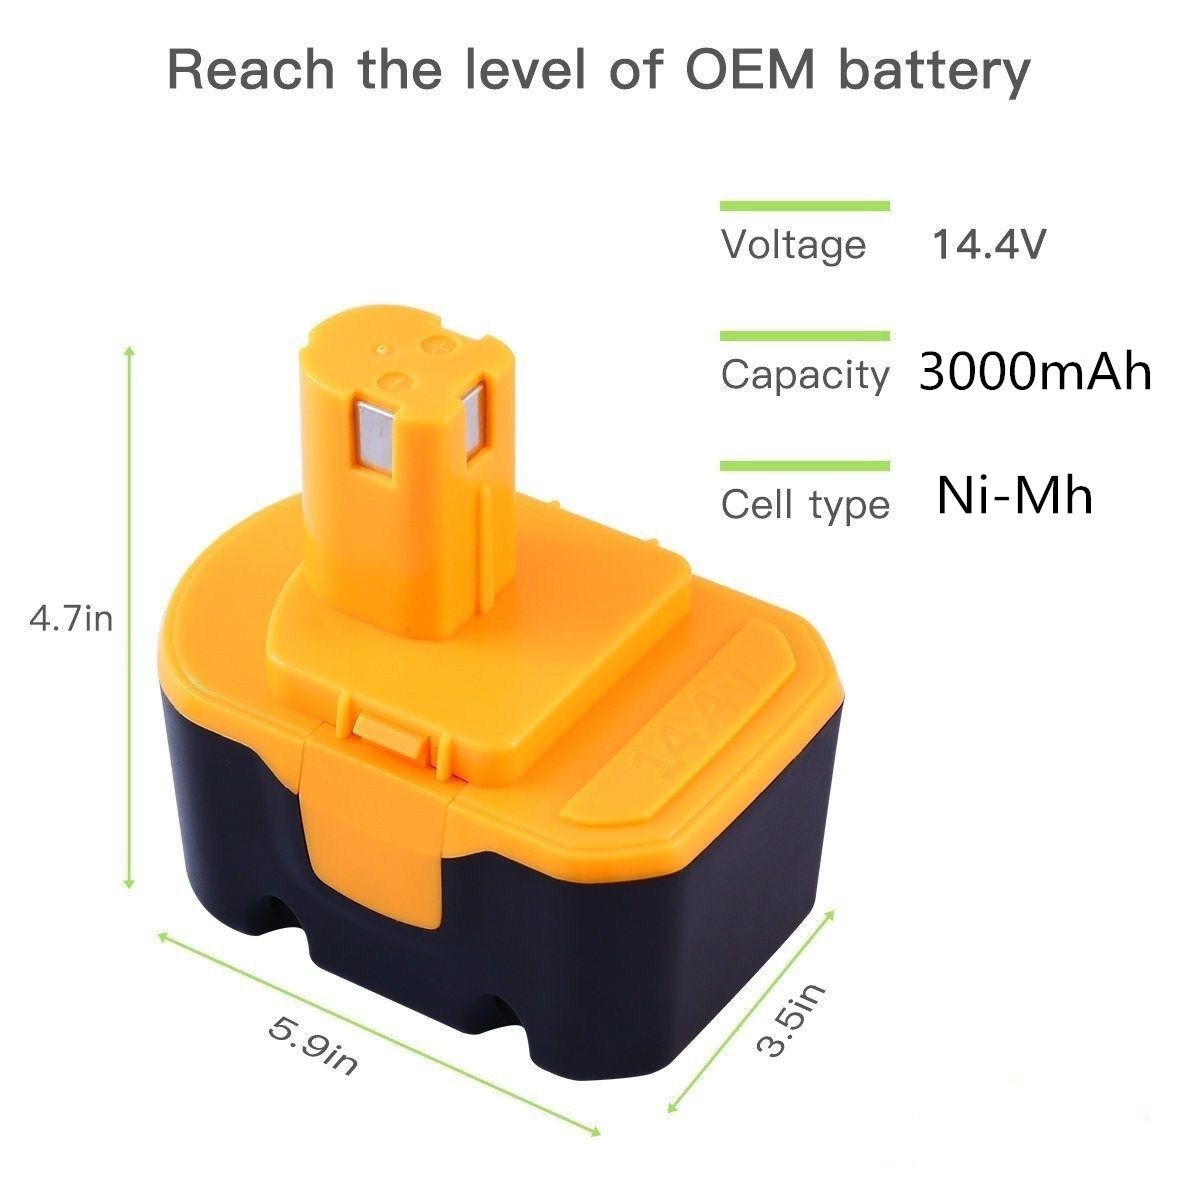 3000mAh 14.4V For Ryobi Battery 130224010 1400671 130224011 HP1442M tools 2PCS